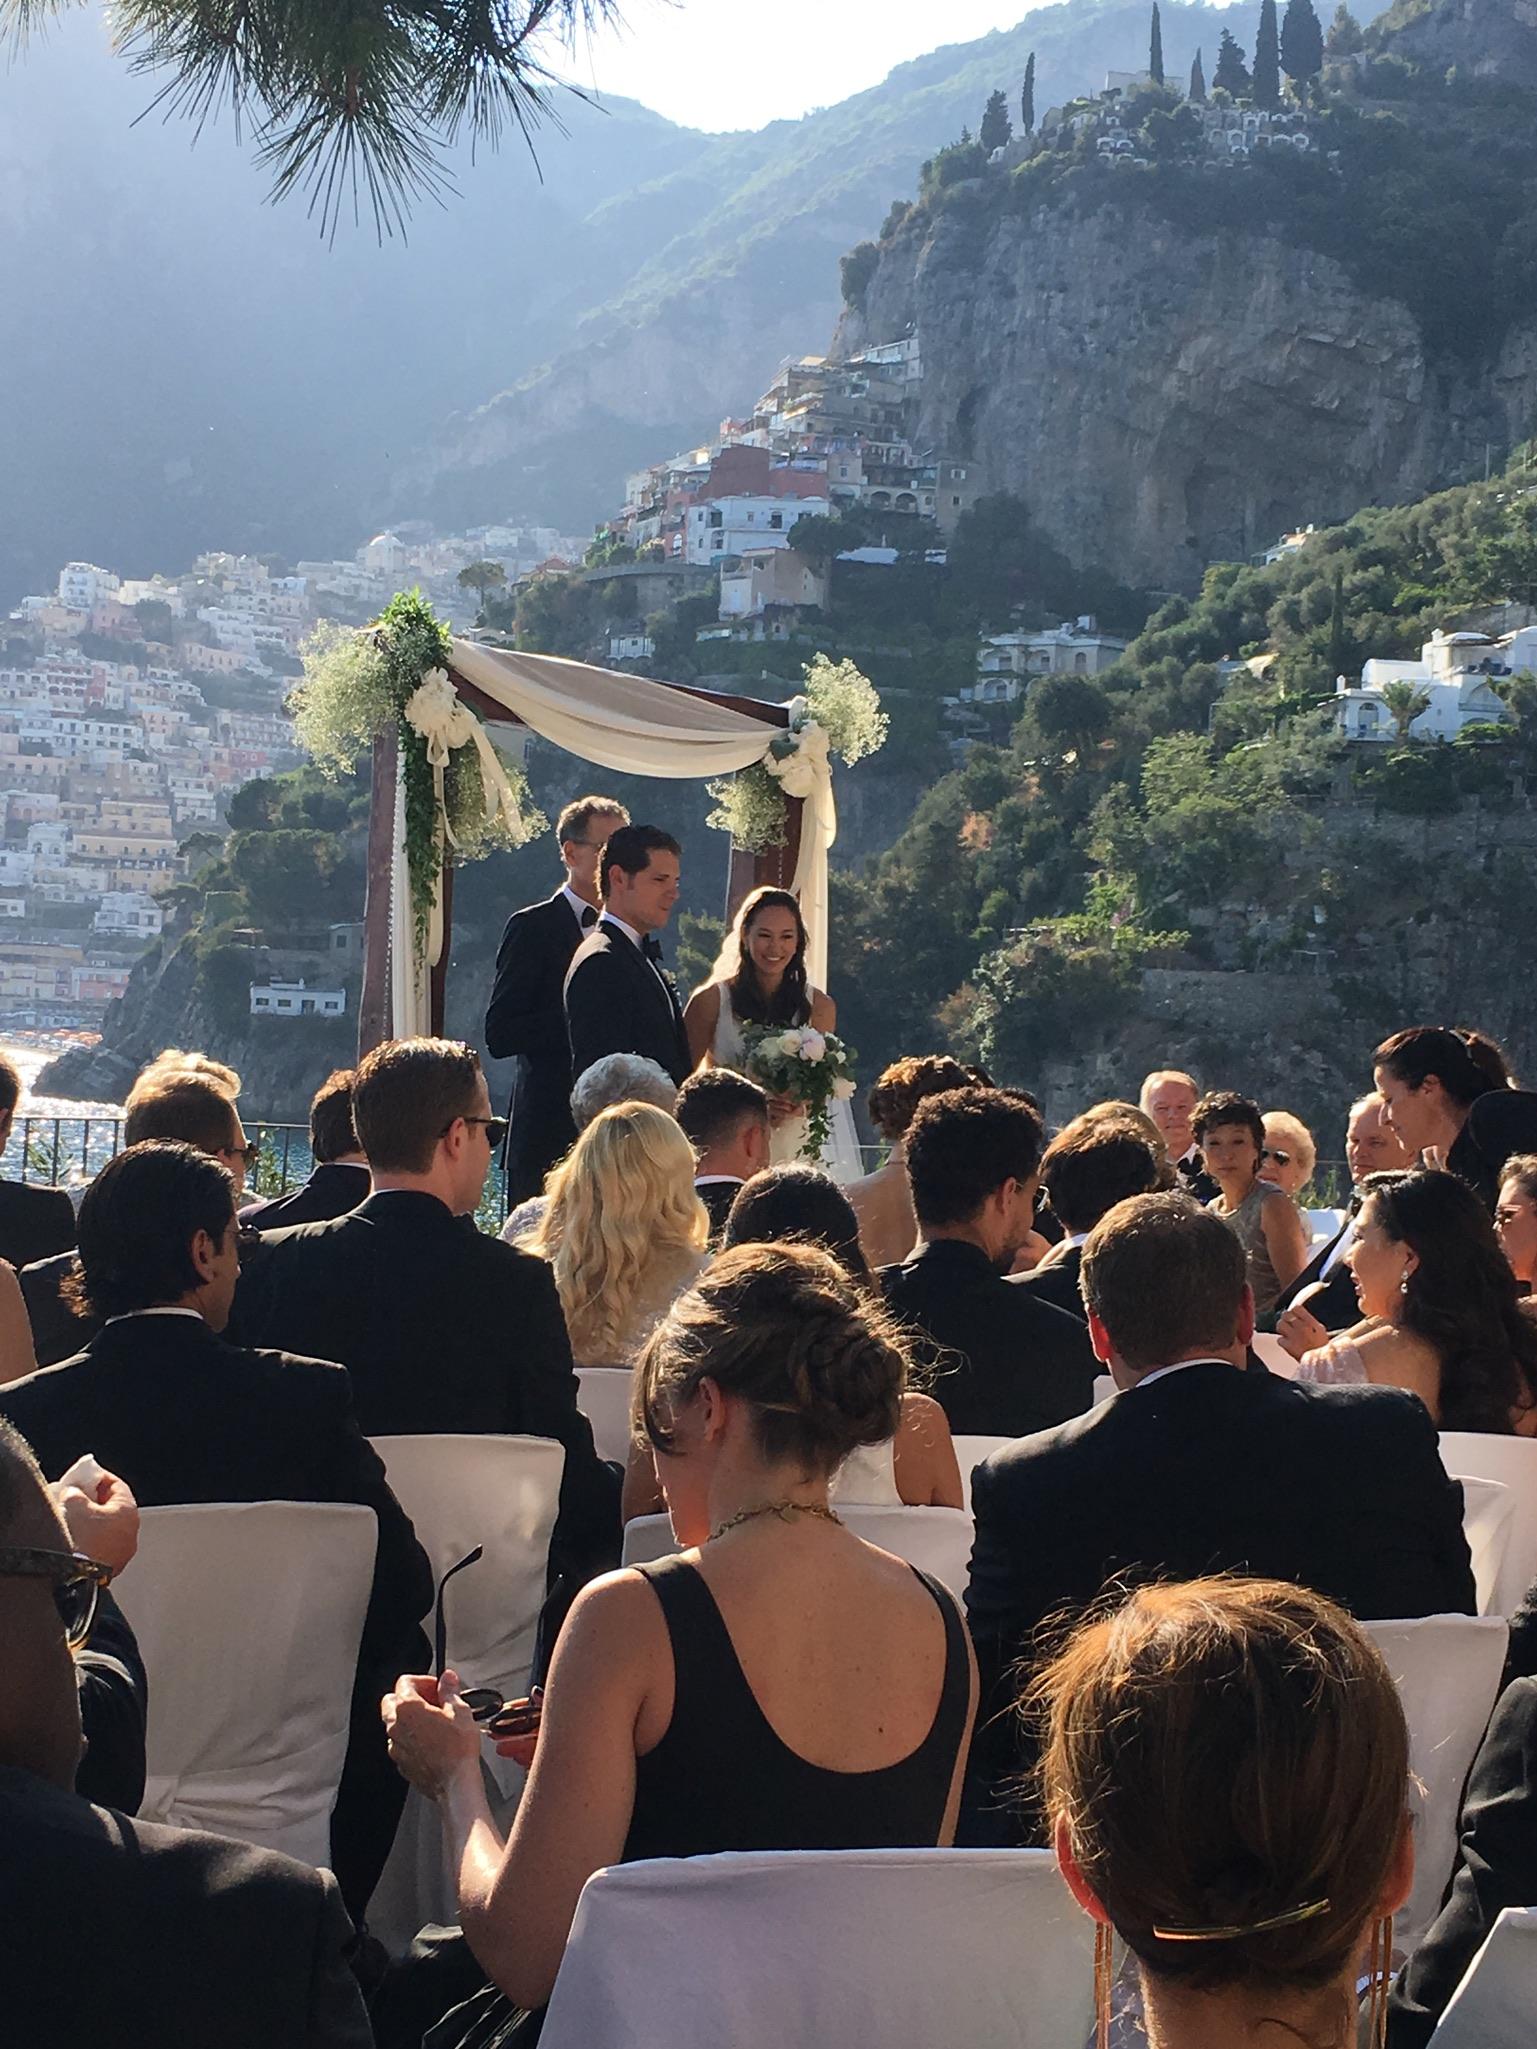 https://www.weddingamalfi.com/wp-content/uploads/Nathalie-and-Benjamin-Wedding-in-Positano-Italy-4.jpg